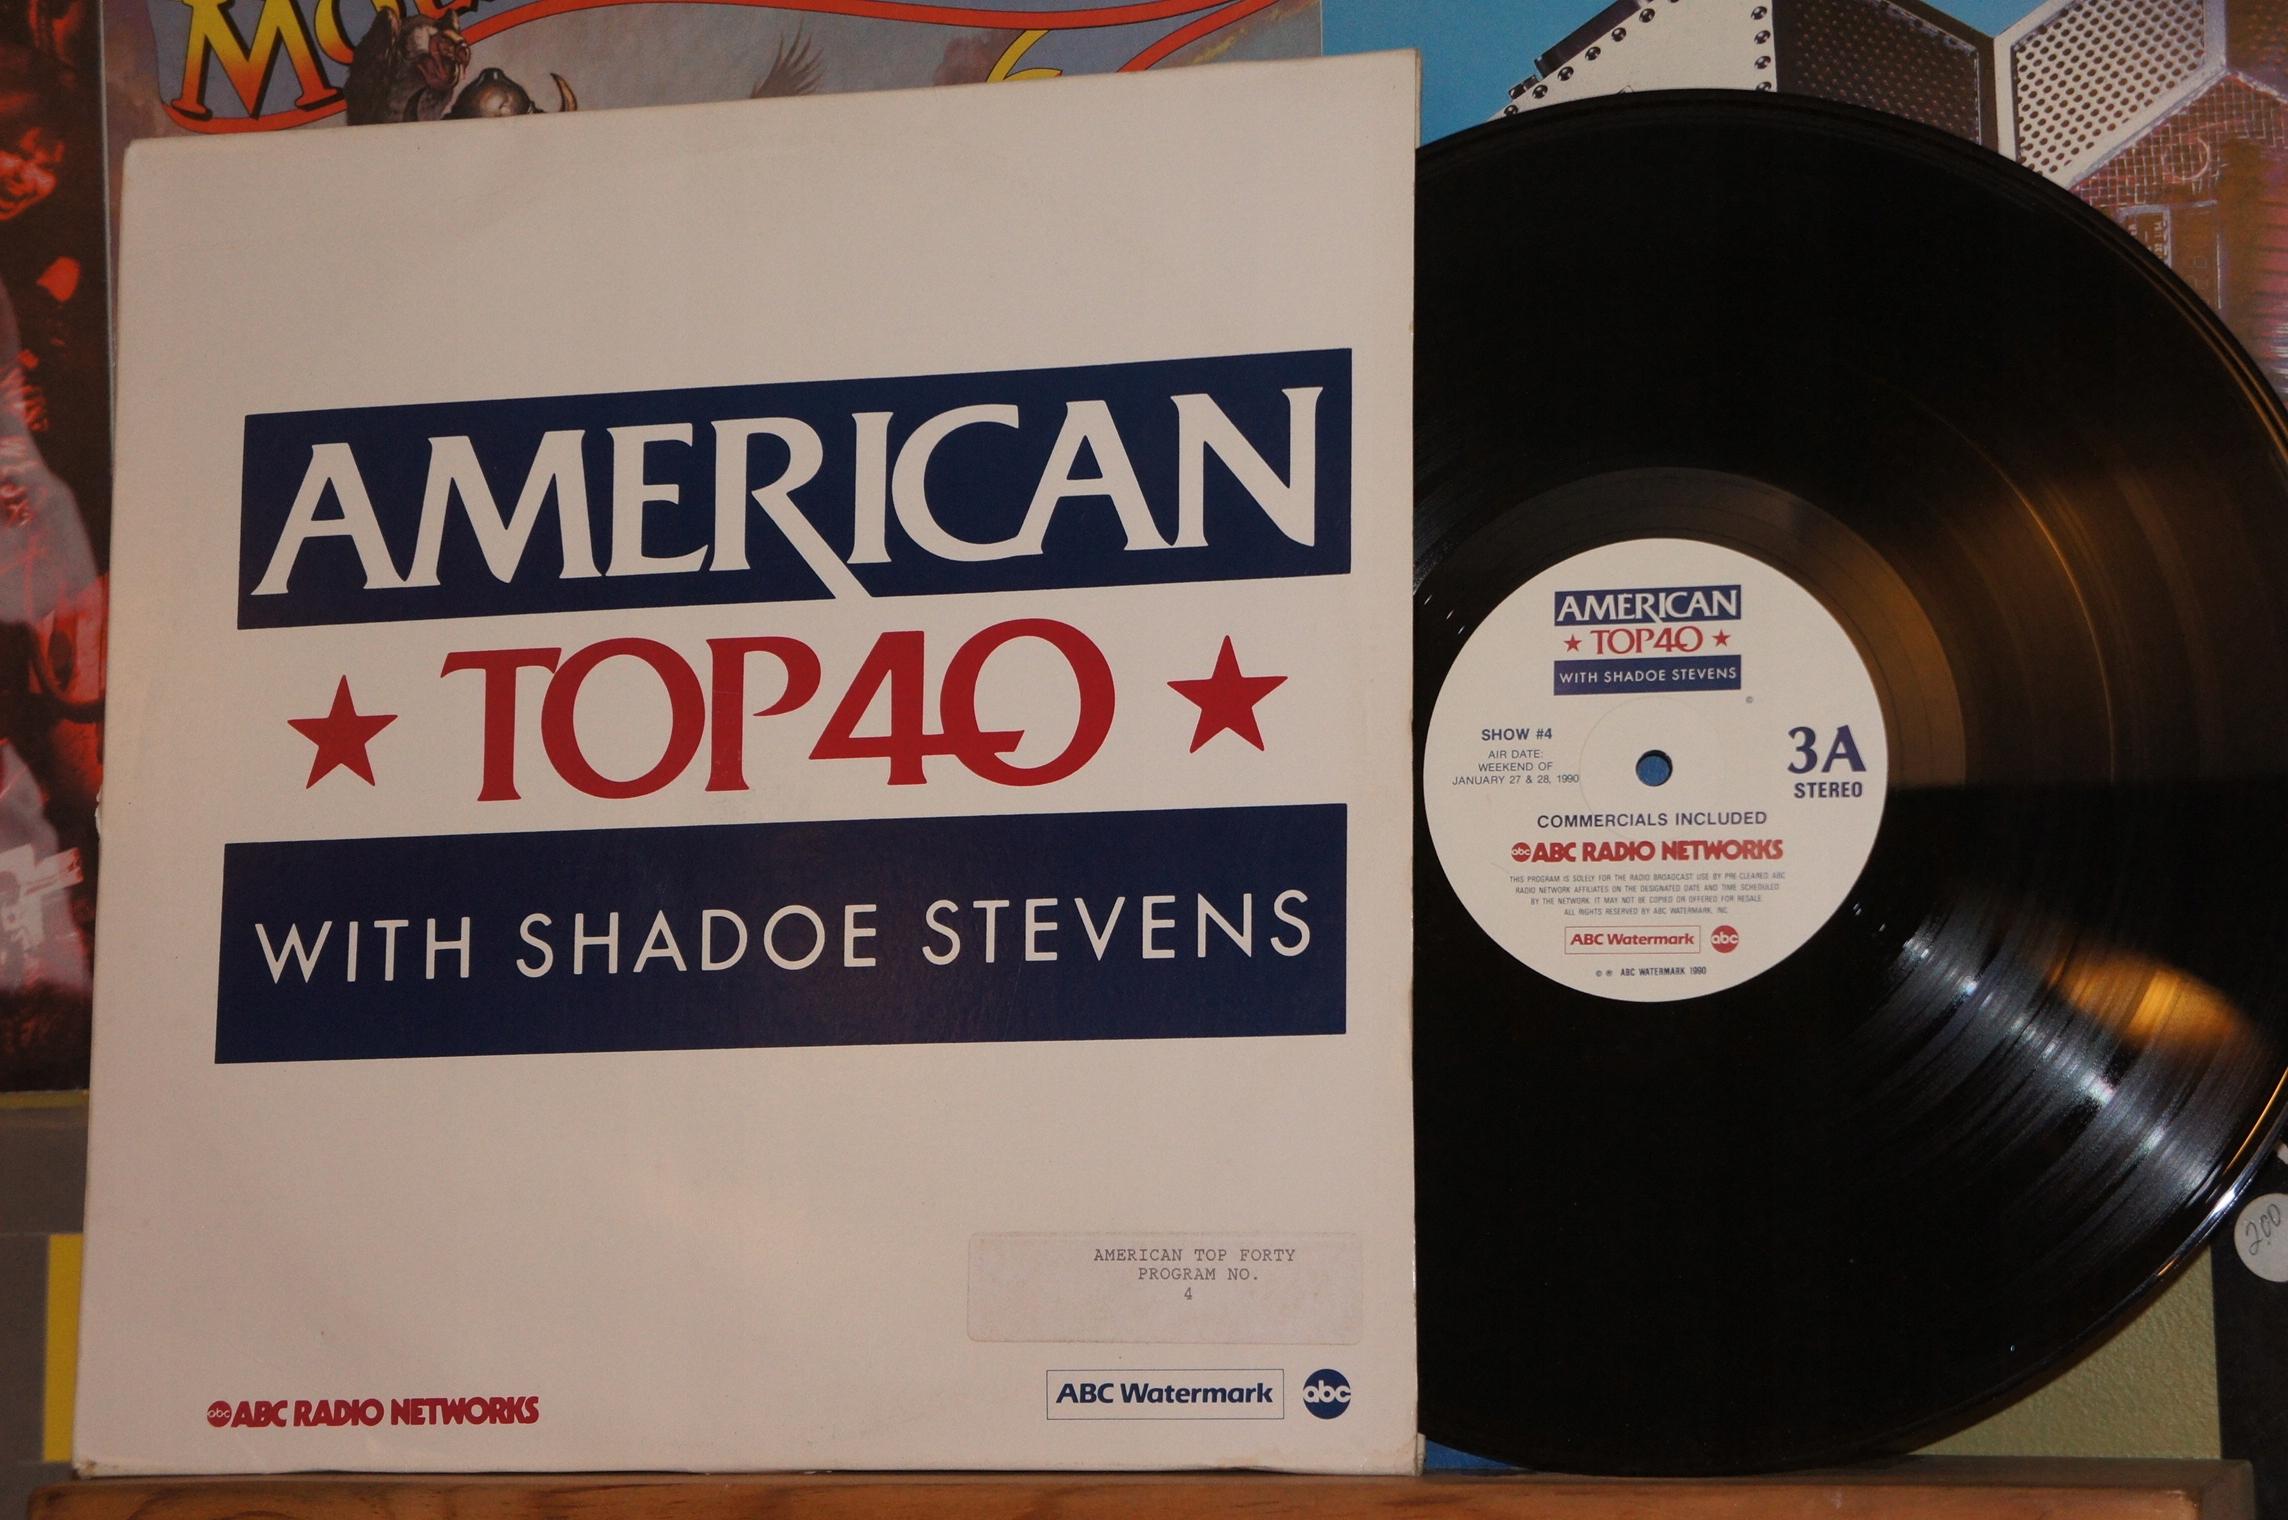 O32  VARIOUS AMERICAN TOP 40 WITH SHADOE STEVENS